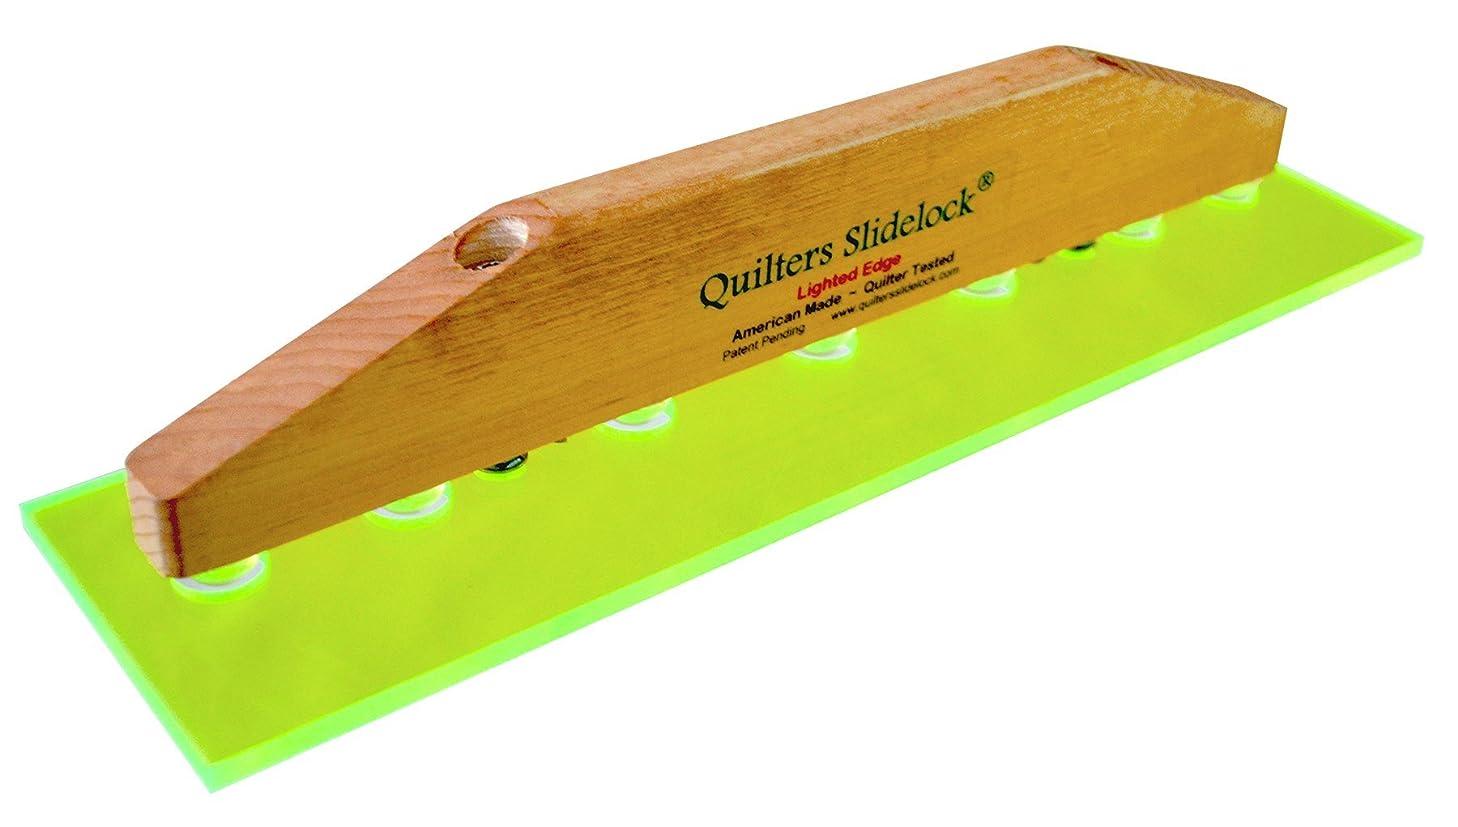 Quilter's Slidelock 14